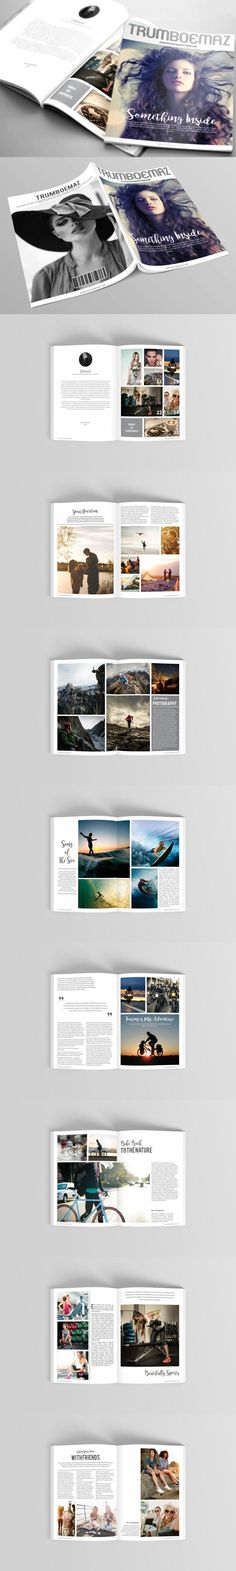 #magazine #design from BoriesBechker | DOWNLOAD: https://creativemarket.com/boriesbechker/593377-Magazine-Template?u=zsoltczigler